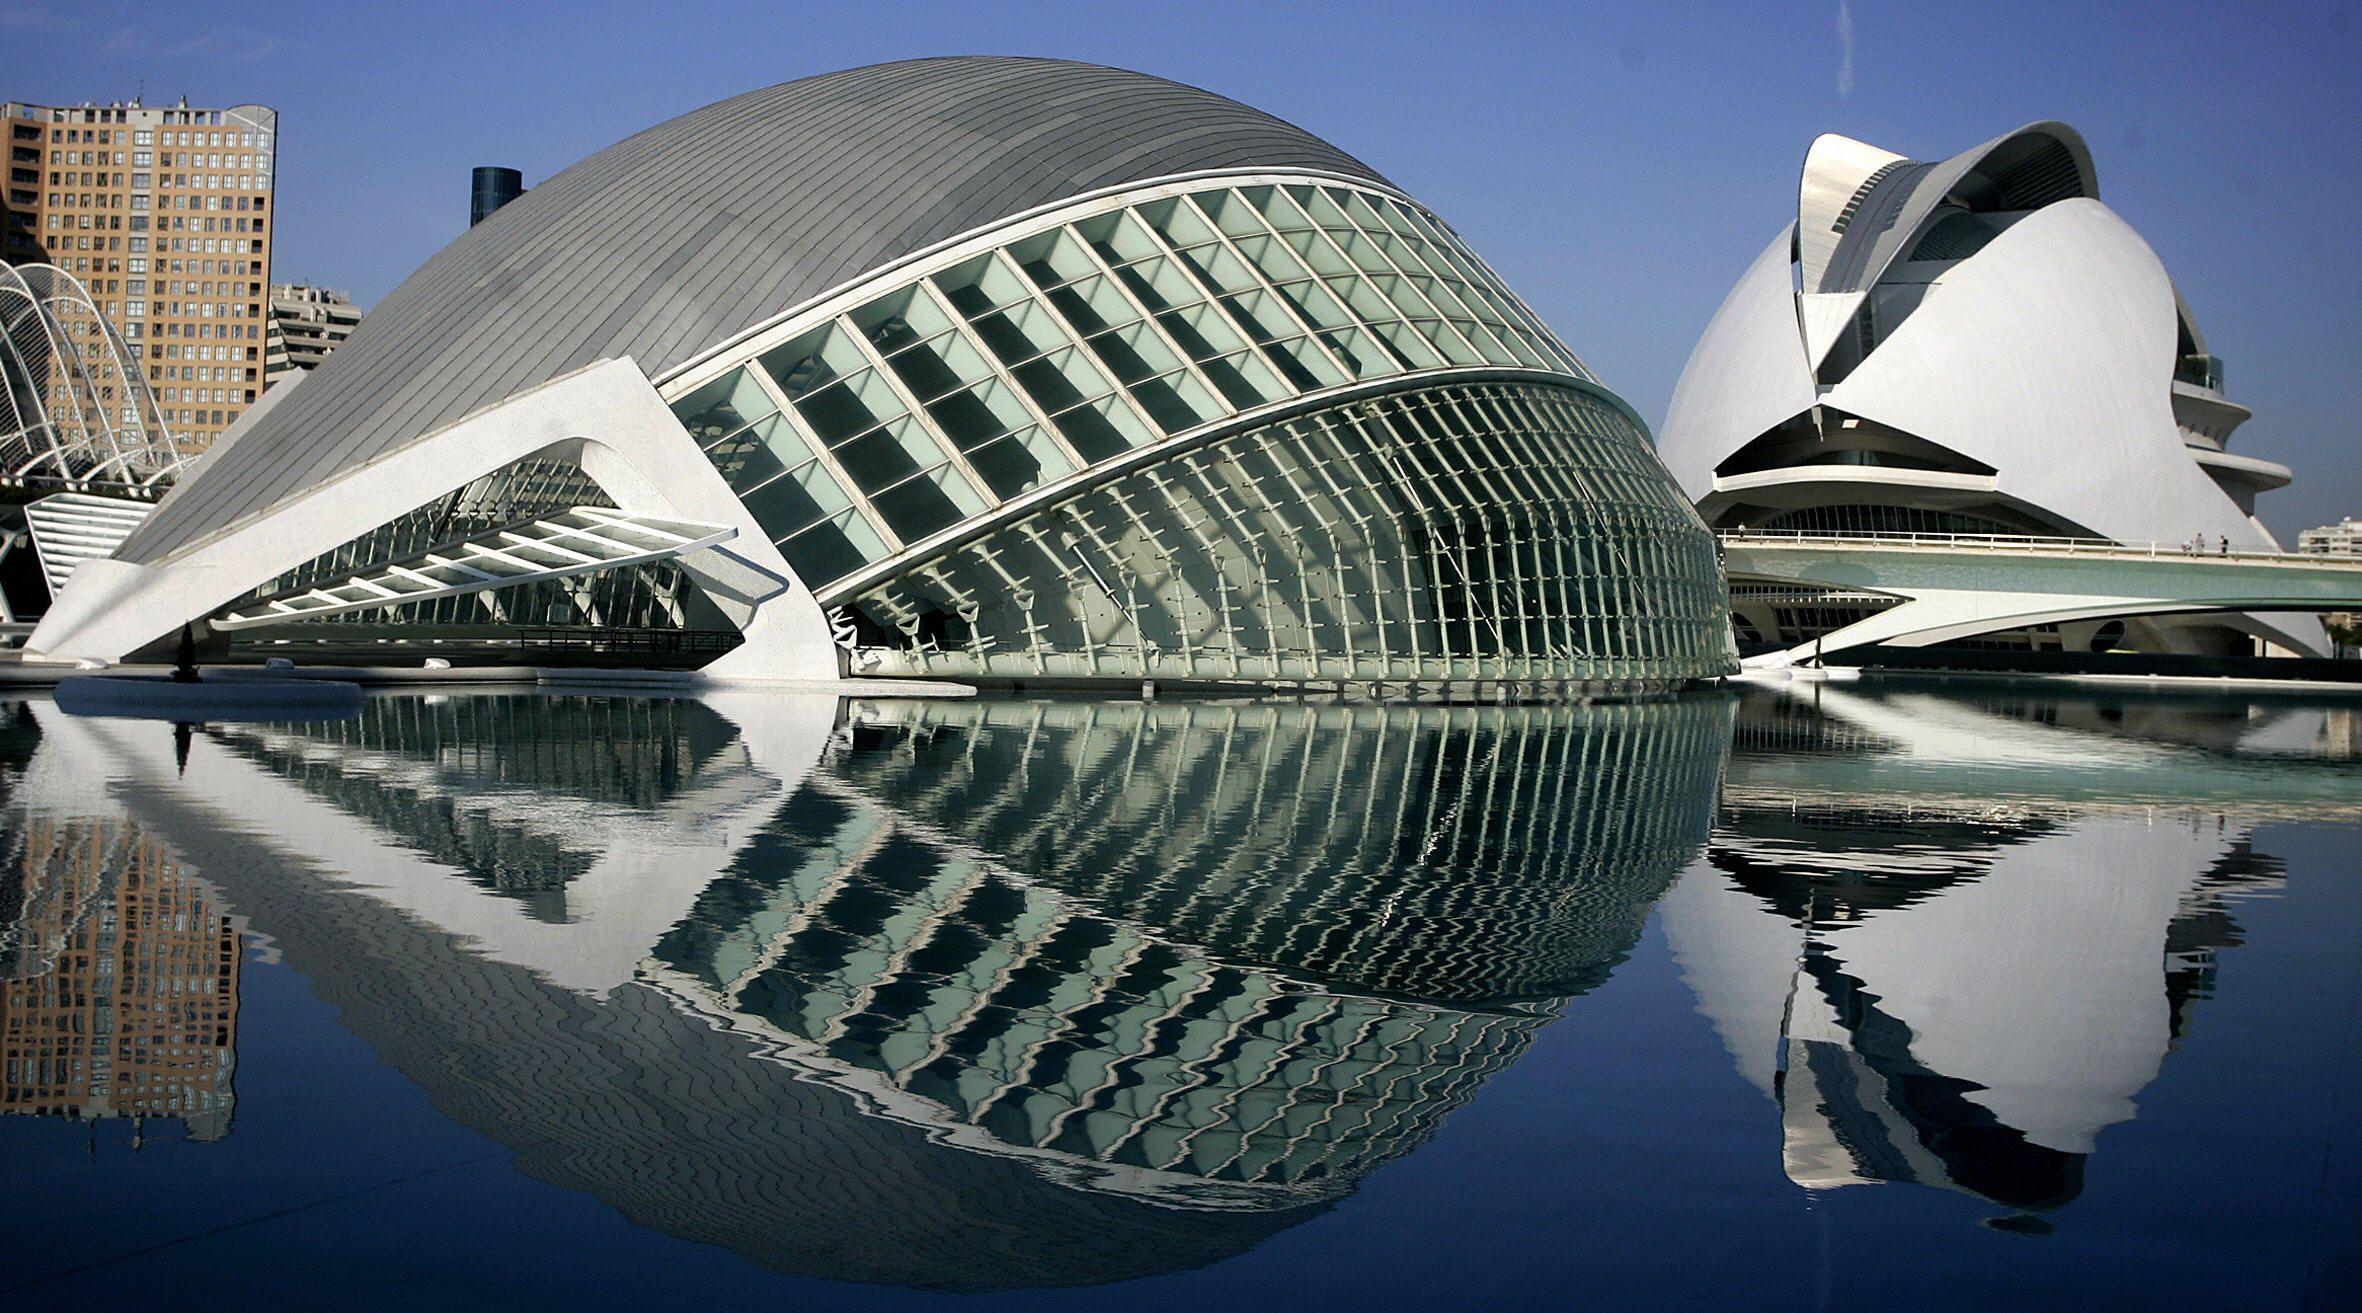 NEW TYPE OF PALACE: Designed By Spanish Architect Santiago Calatrava, The  Palace Of Arts